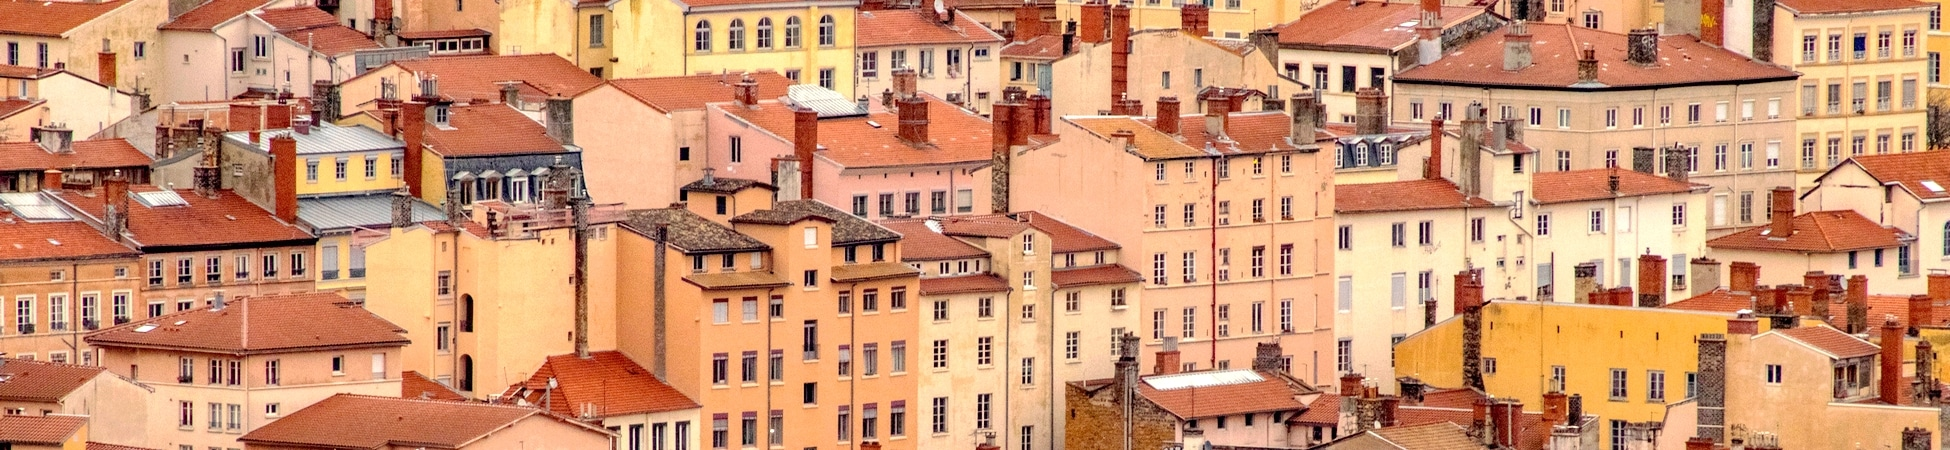 5 idees de weekend citybreak en france